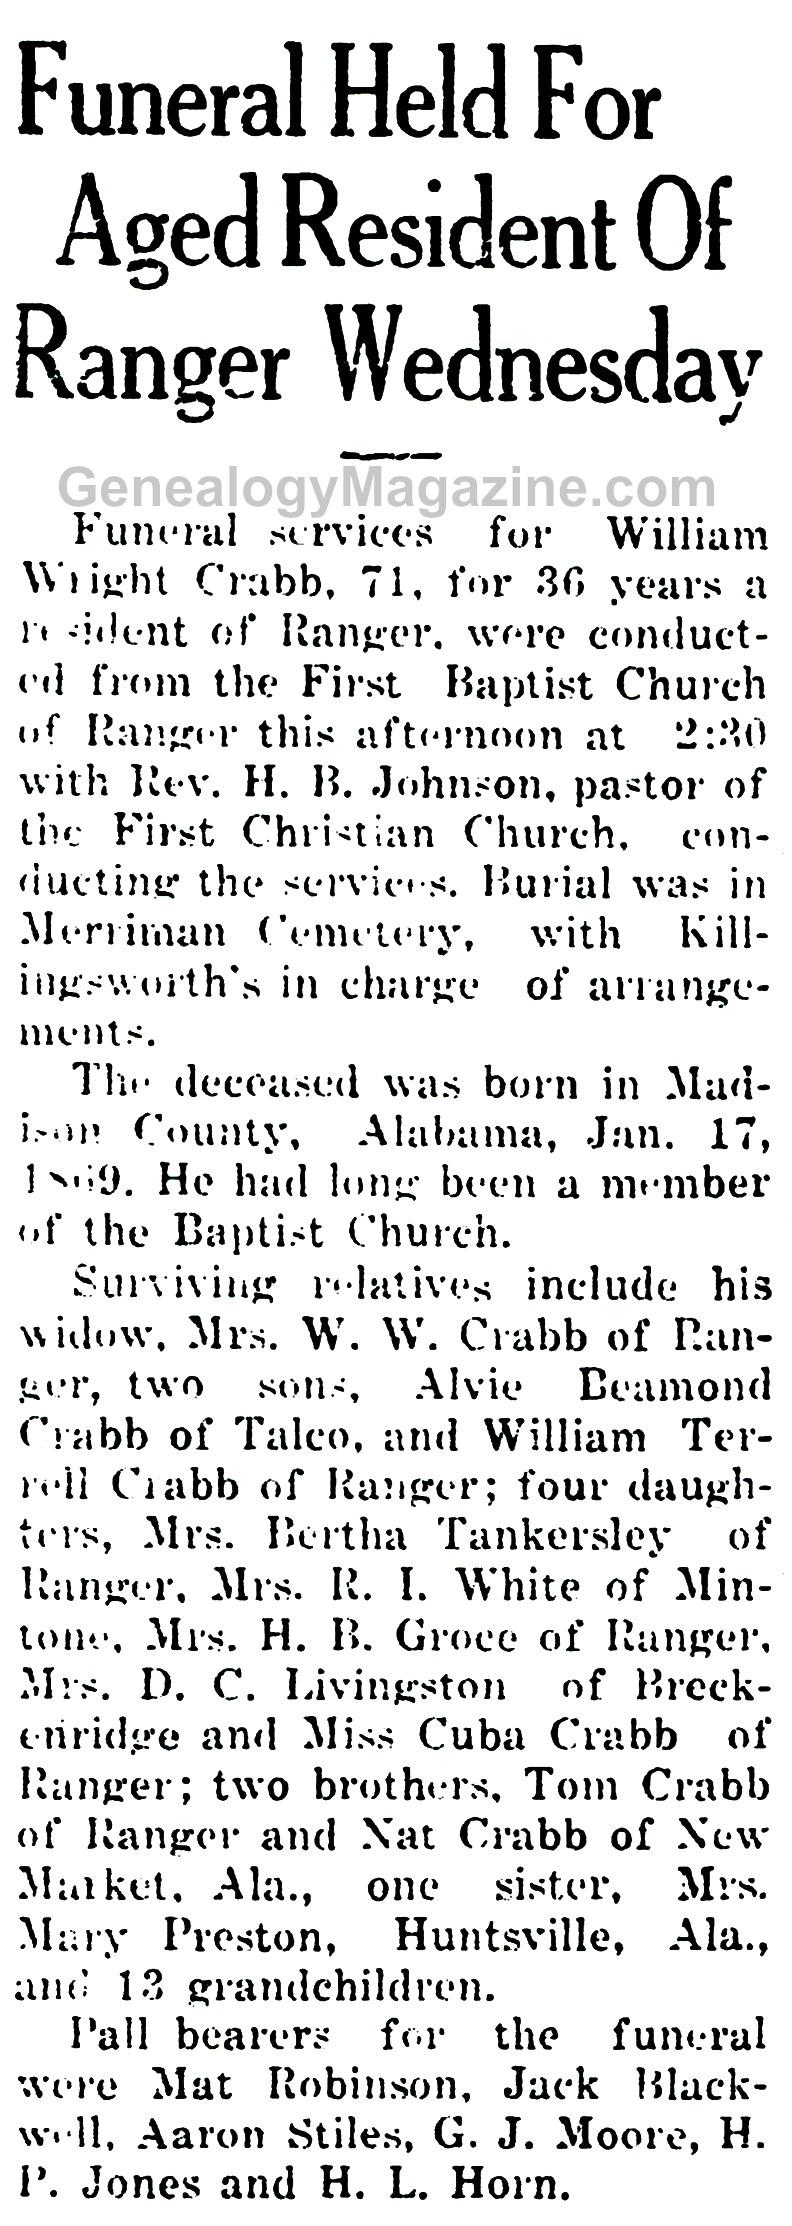 William Wright Crabb obituary